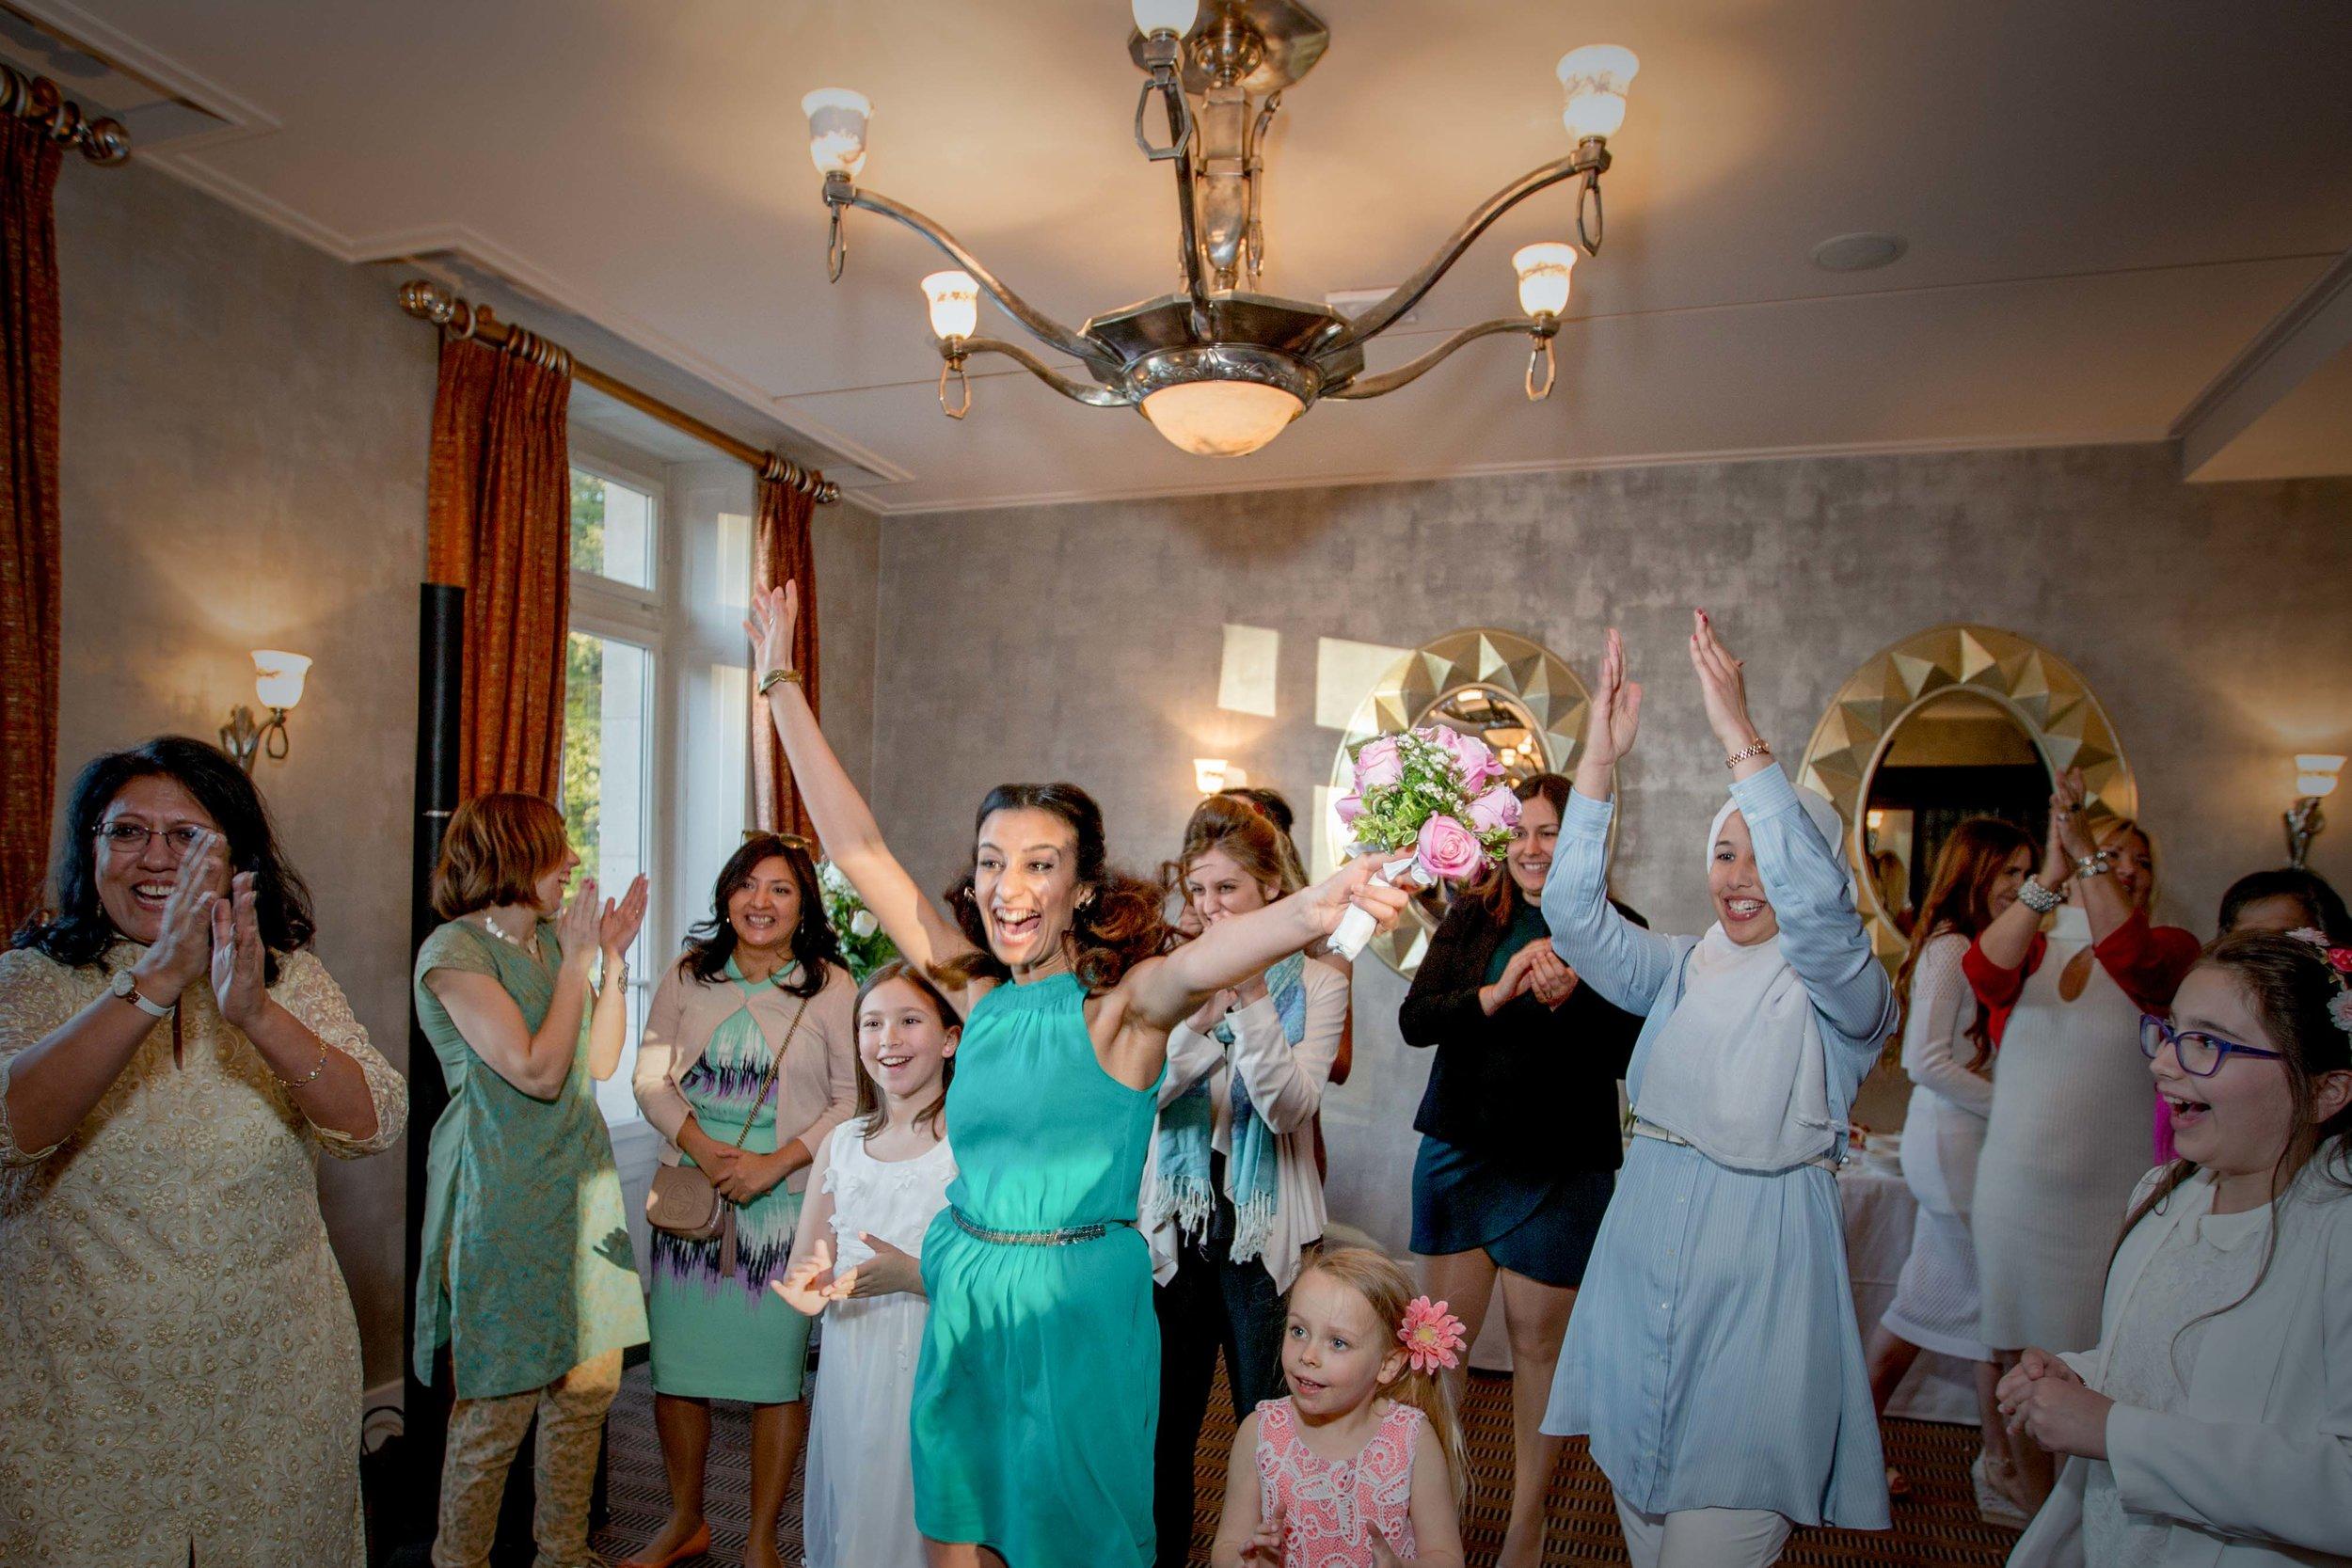 parc-des-eaux-vives-destination-wedding-photographer-geneva-switzerland-natalia-smith-photography-92.jpg